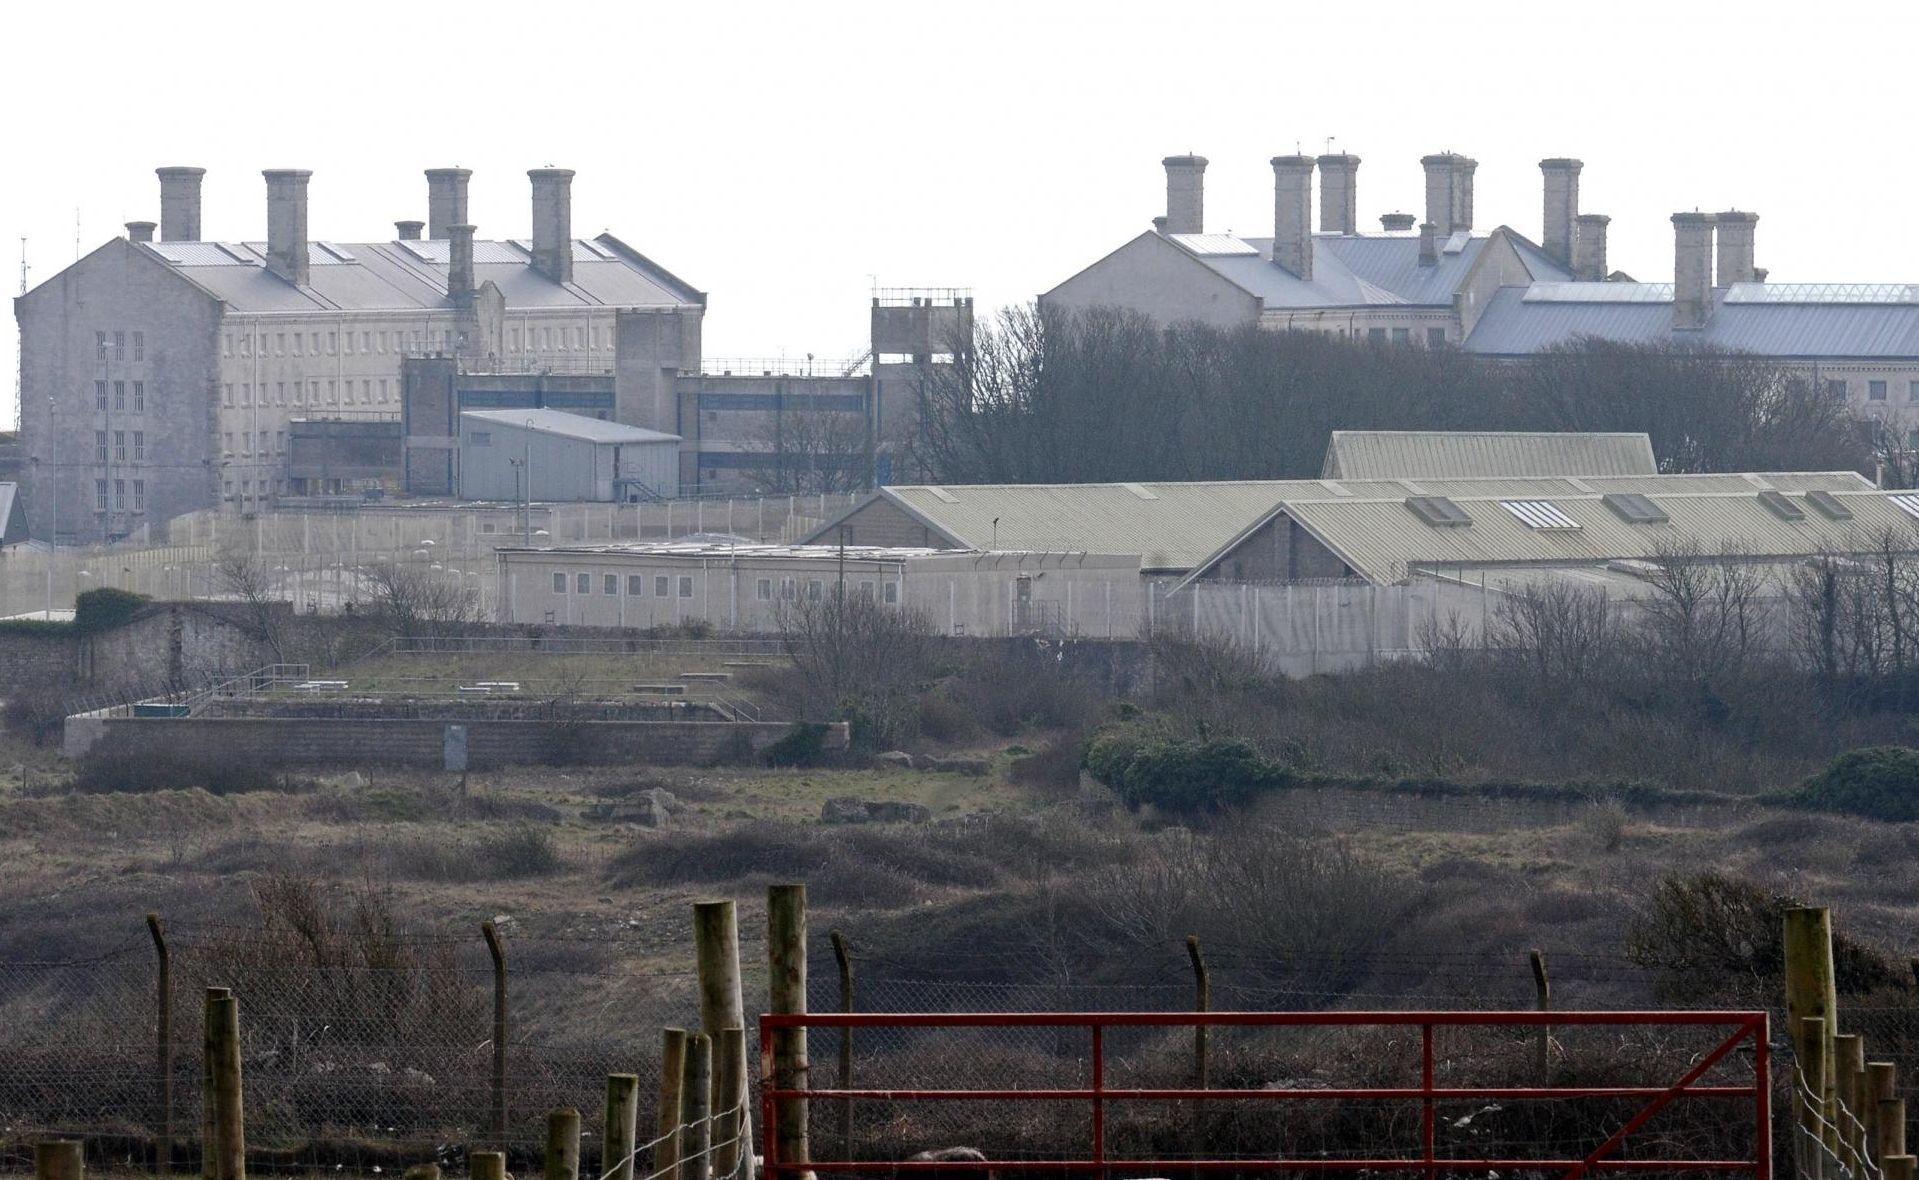 HMP Portland on ITV's Inside Prison: Britain Behind Bars